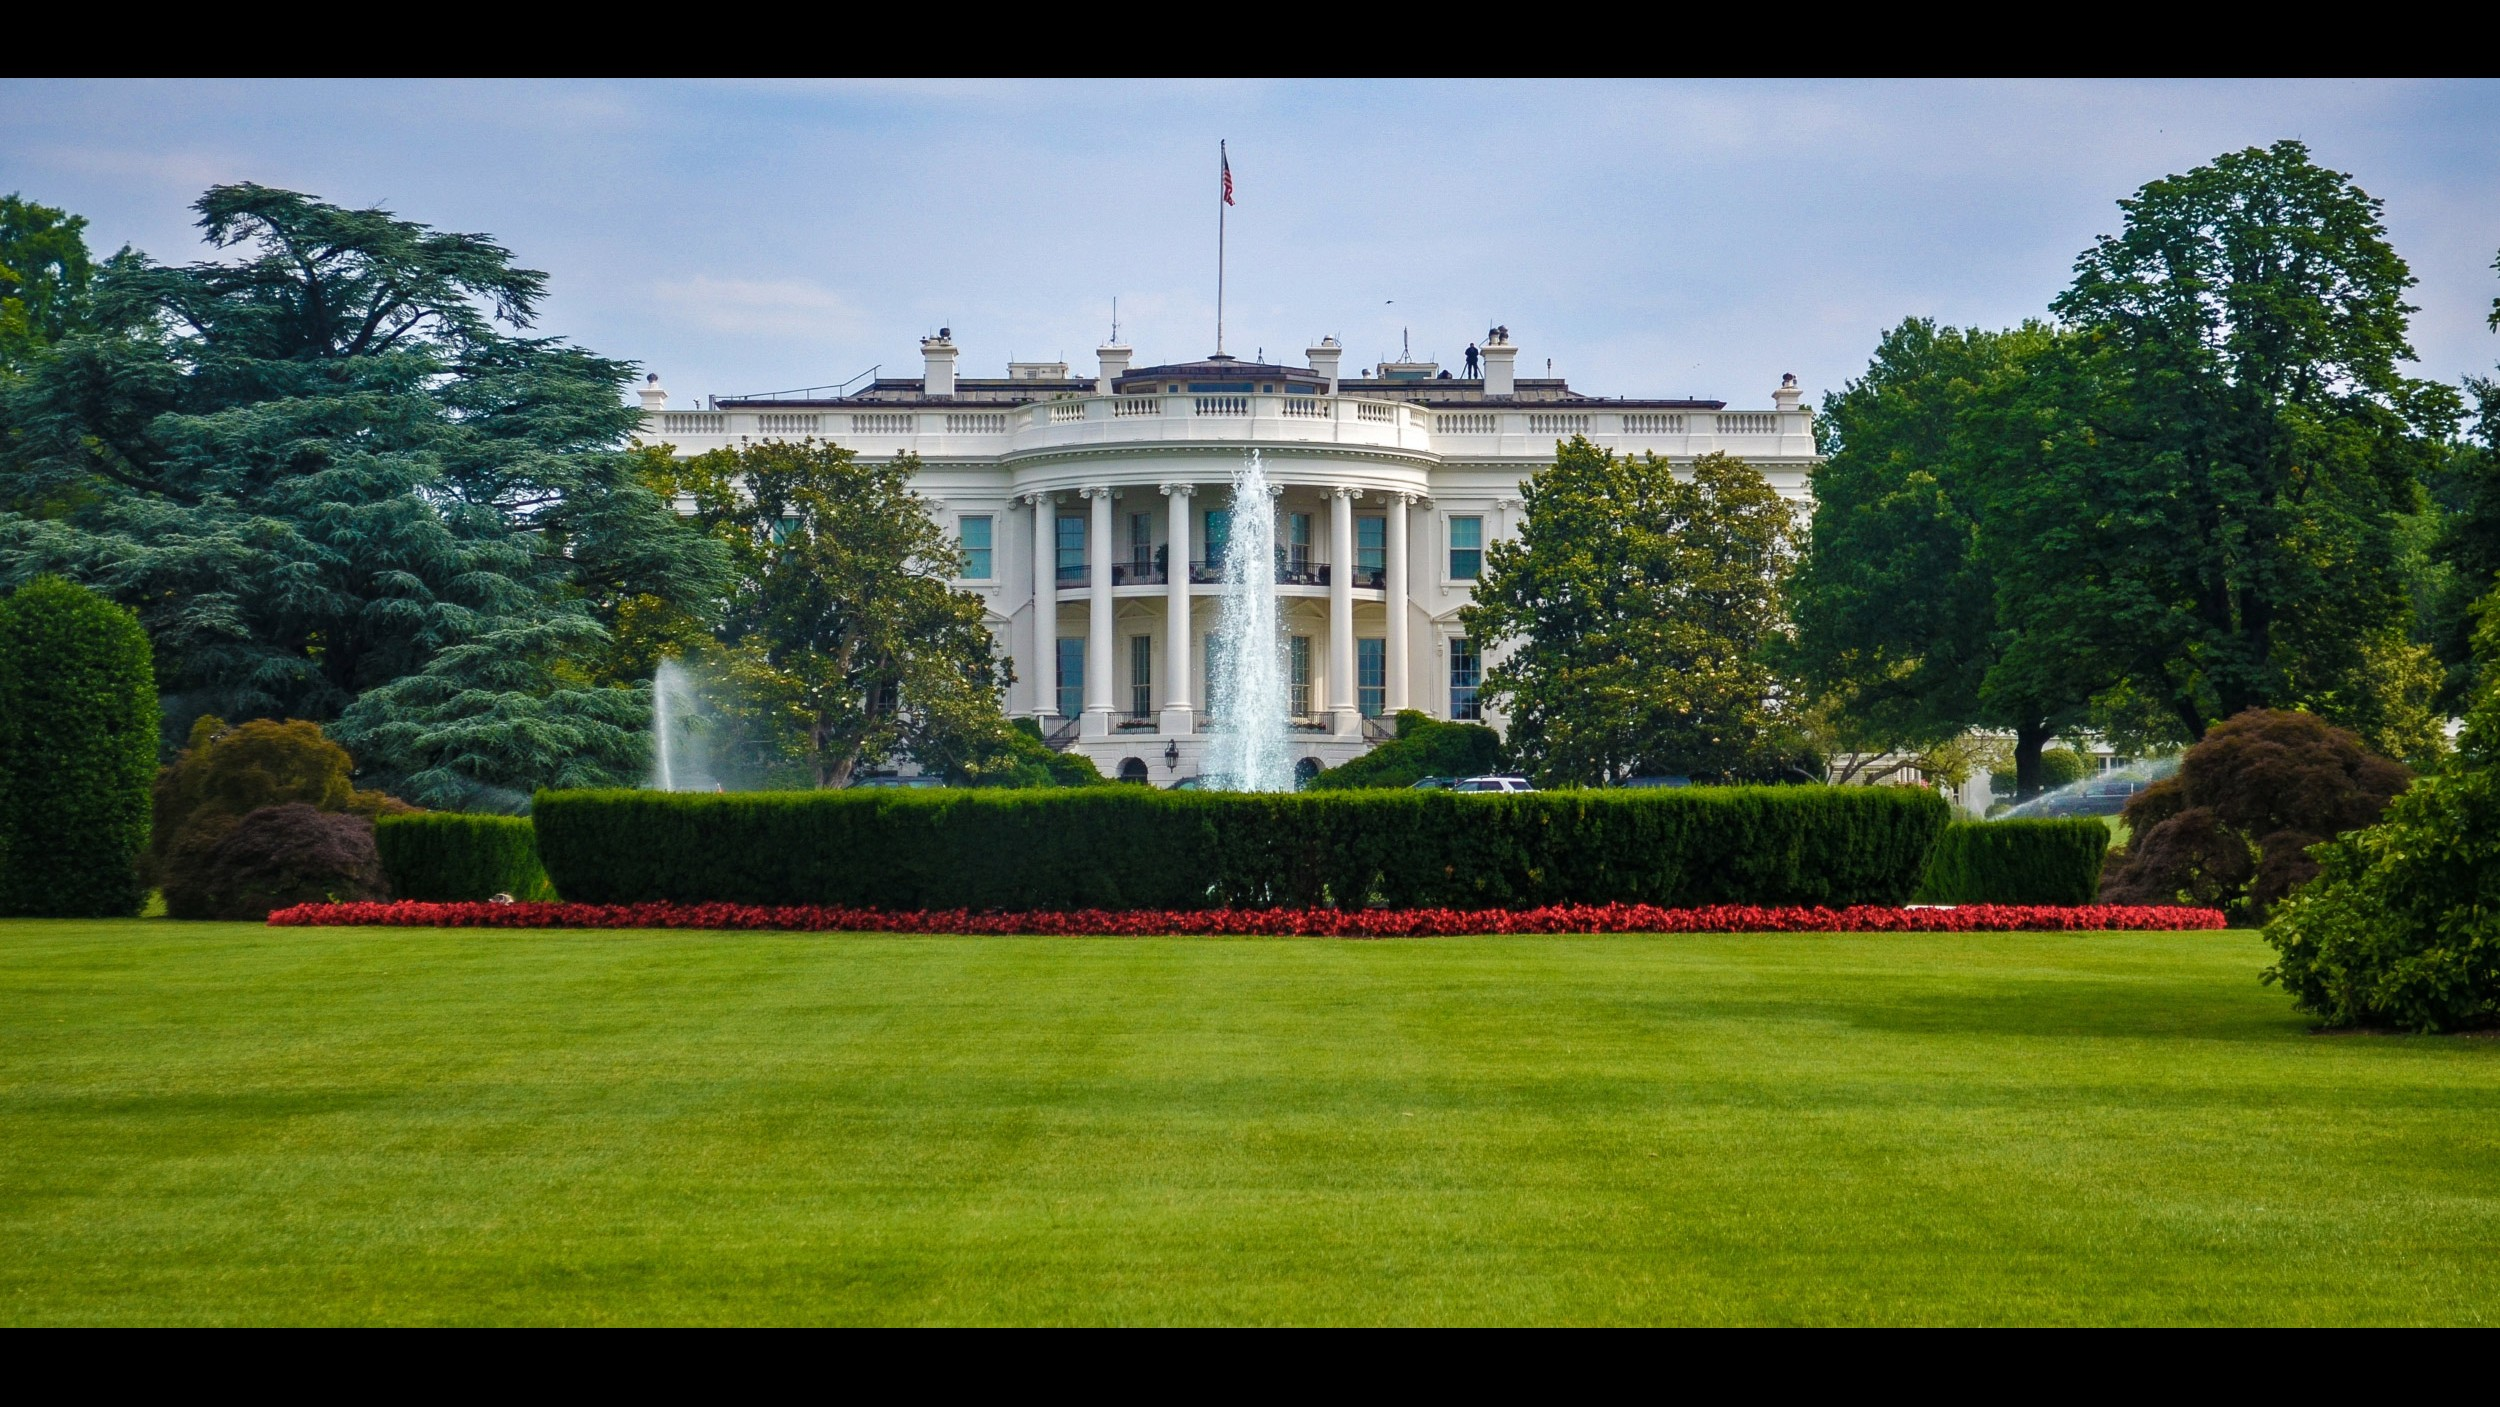 BLOG: ABD'NİN 24 NİSAN AÇIKLAMALARI - 17.04.2021